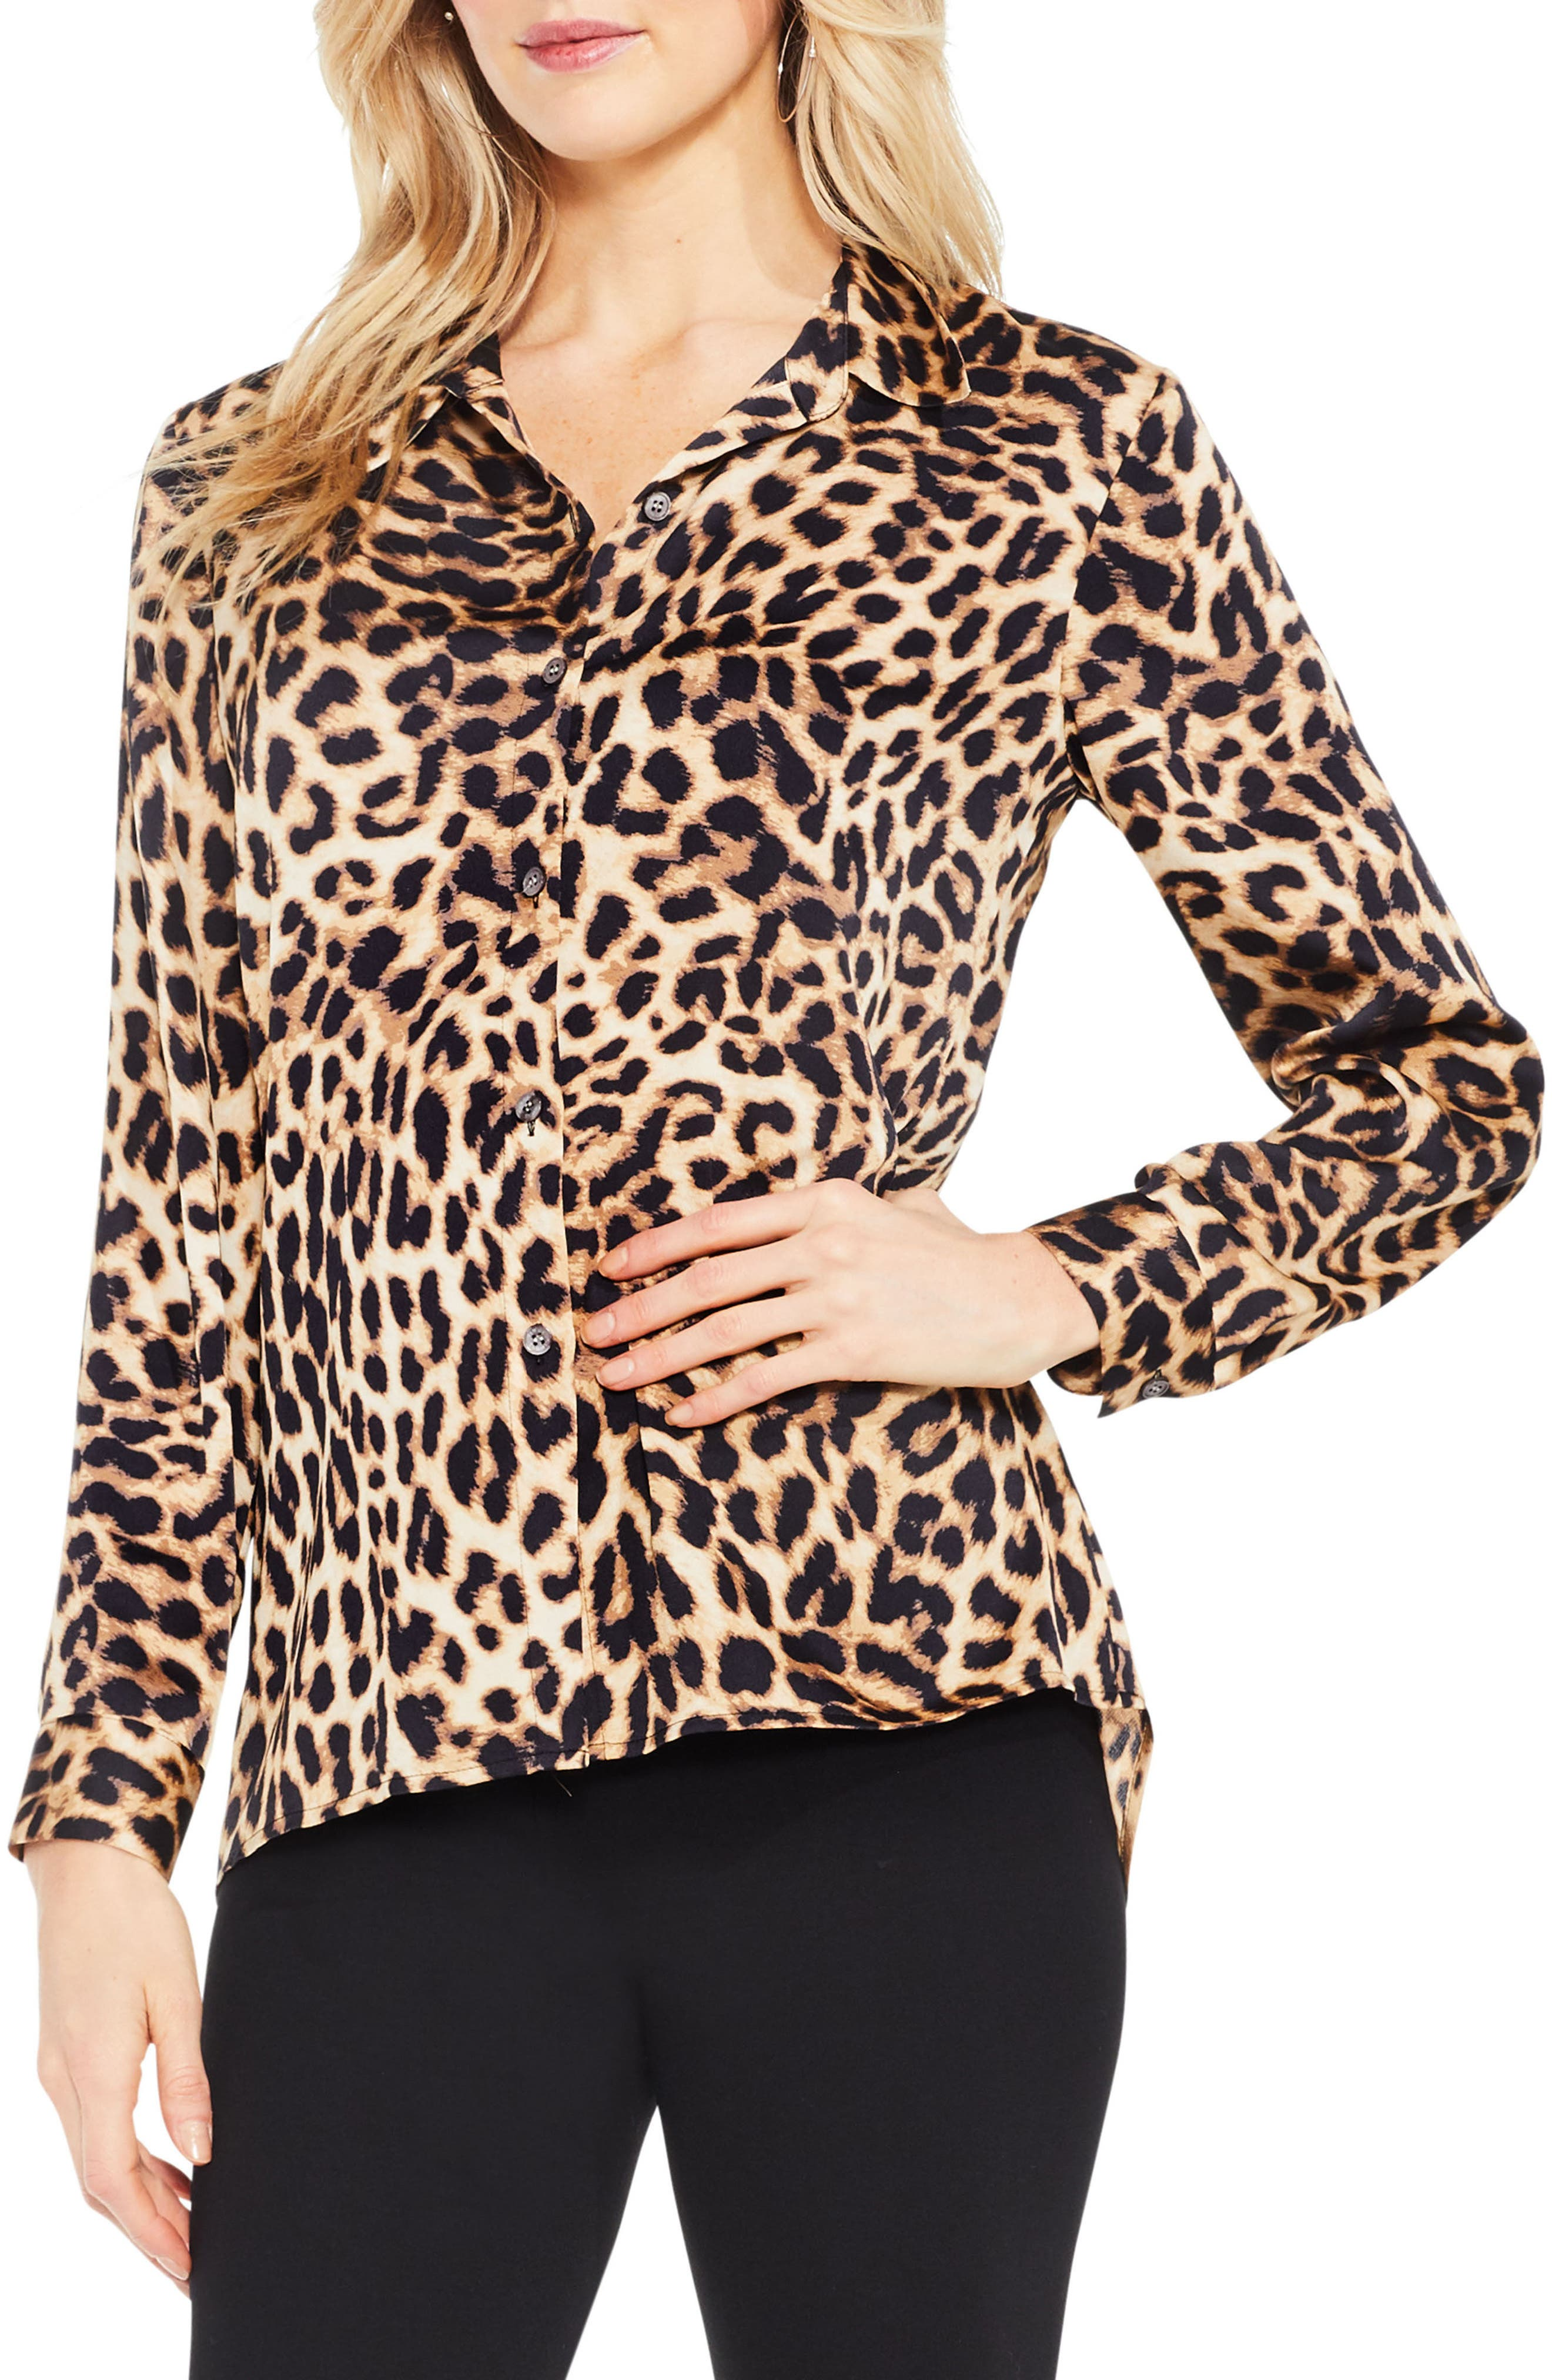 Main Image - Vince Camuto Leopard Print Blouse